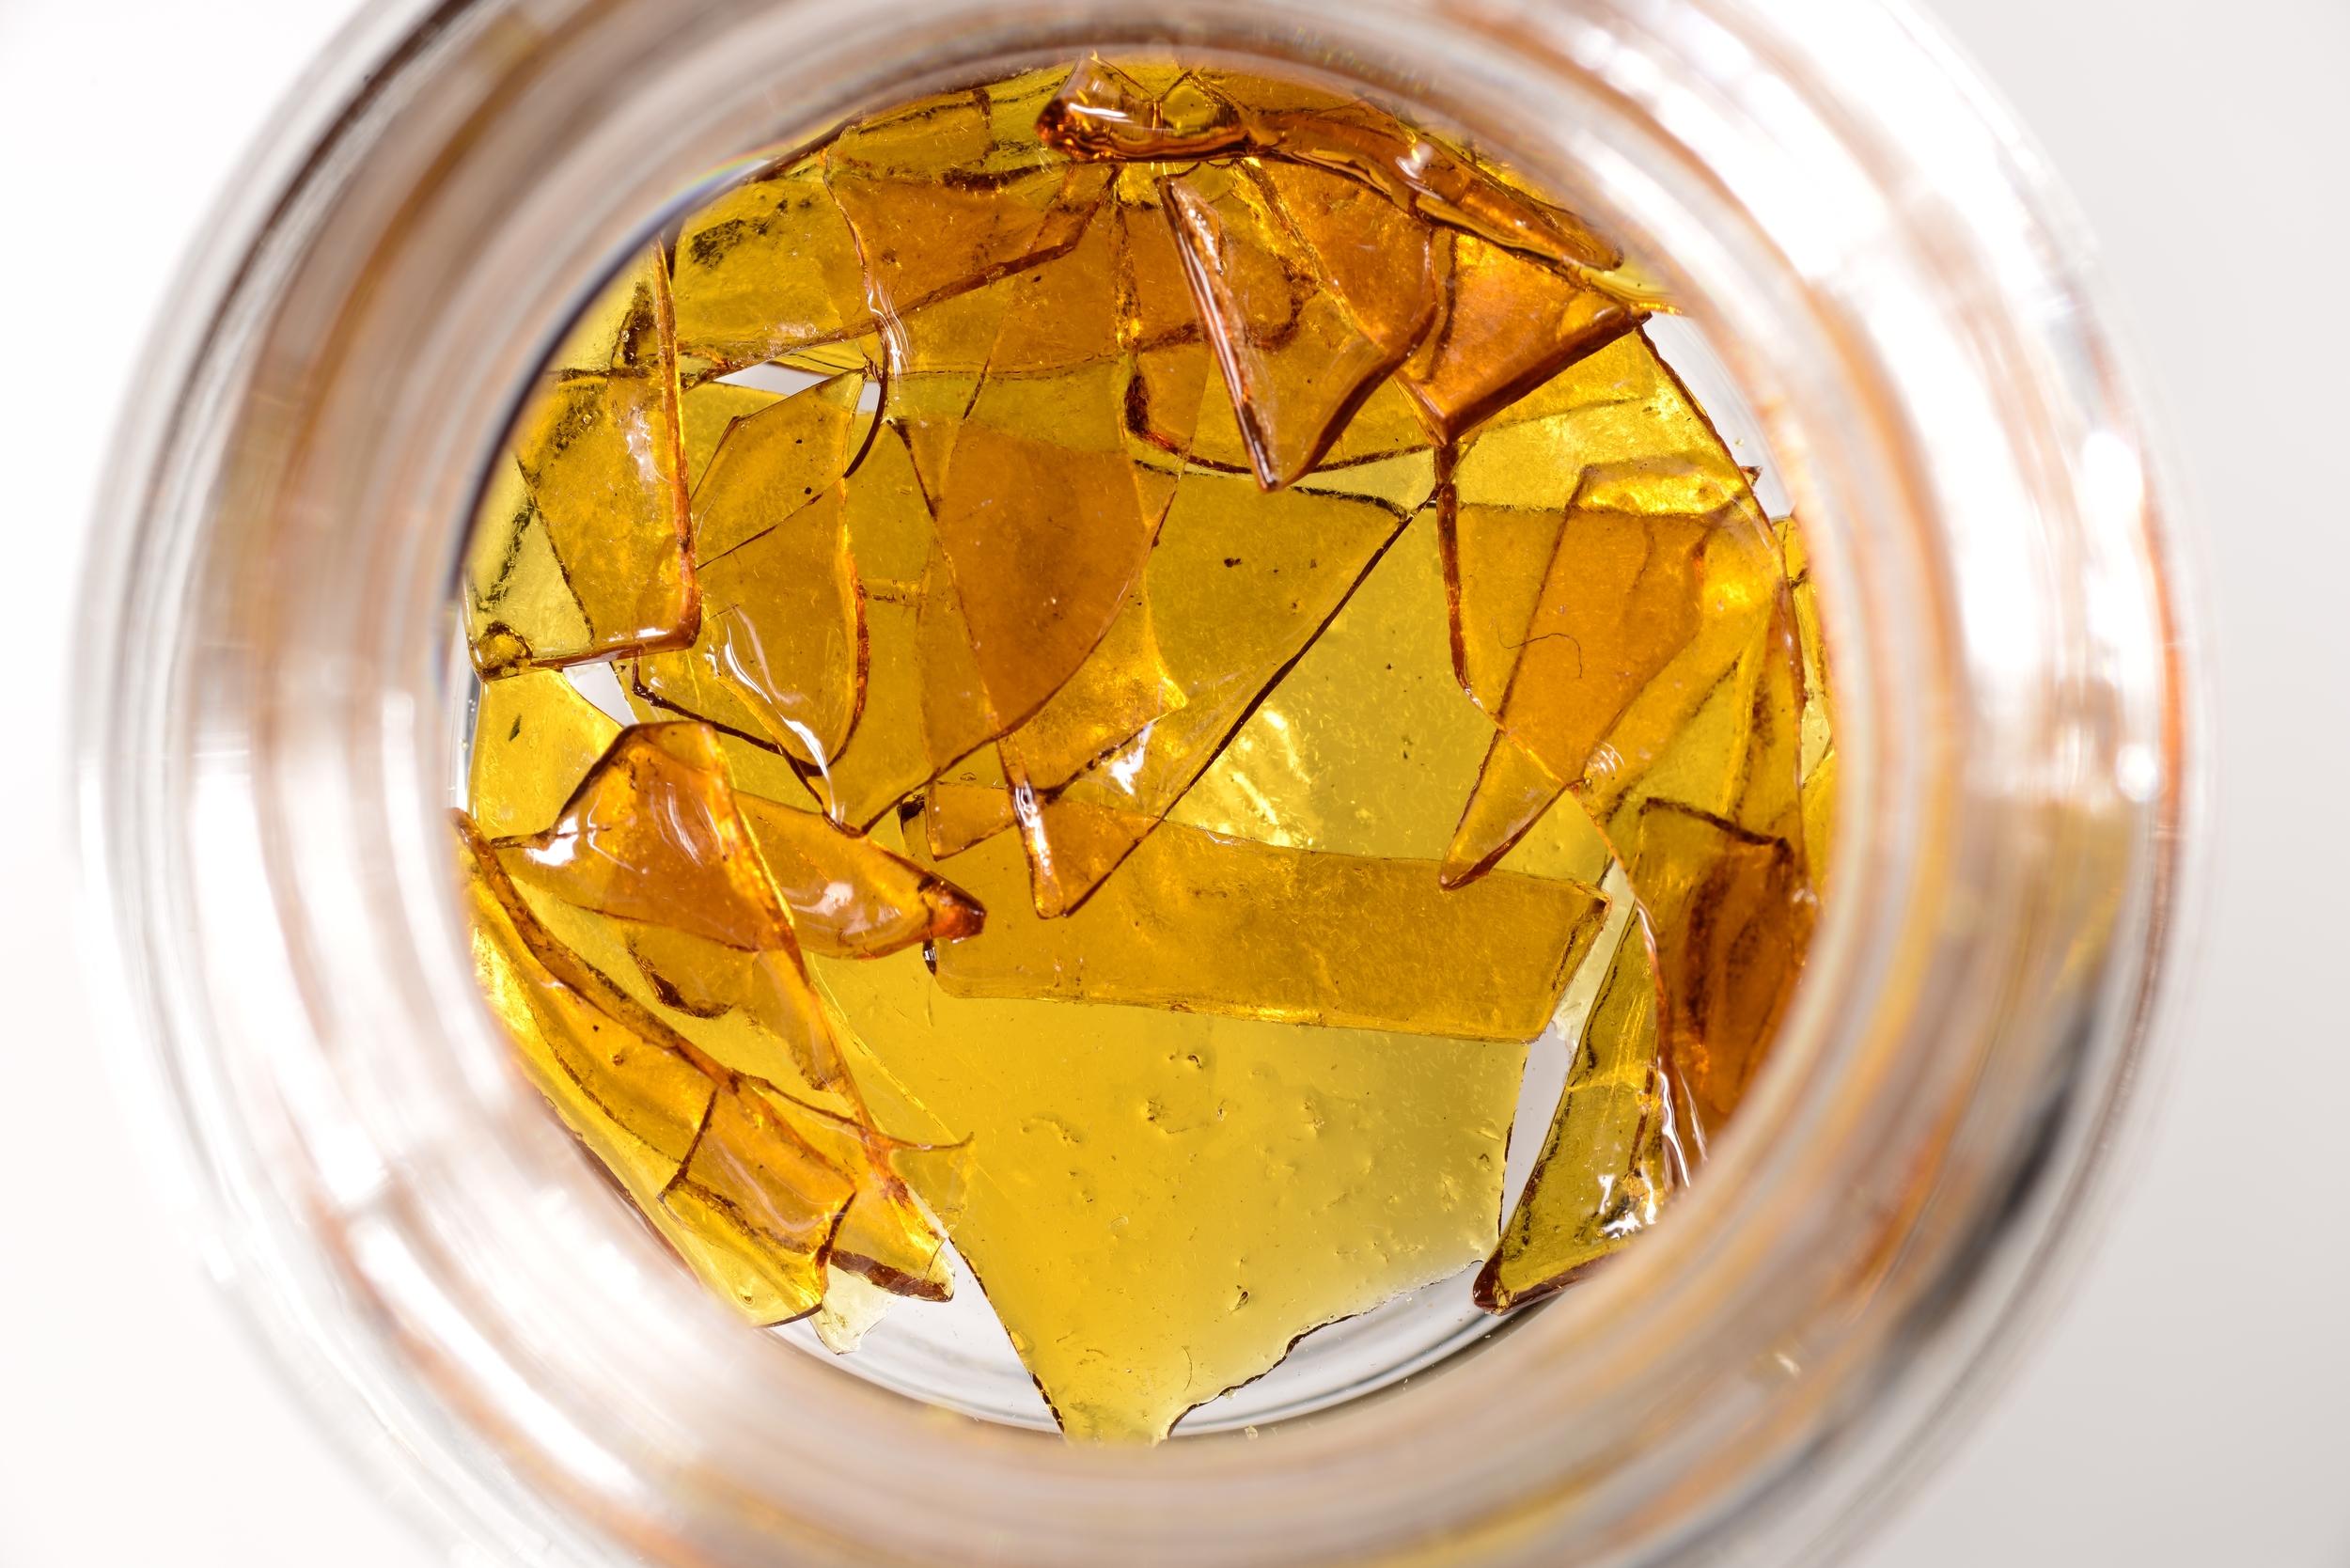 Crystal Clear Shatter Indica Banana Og Tested Weed